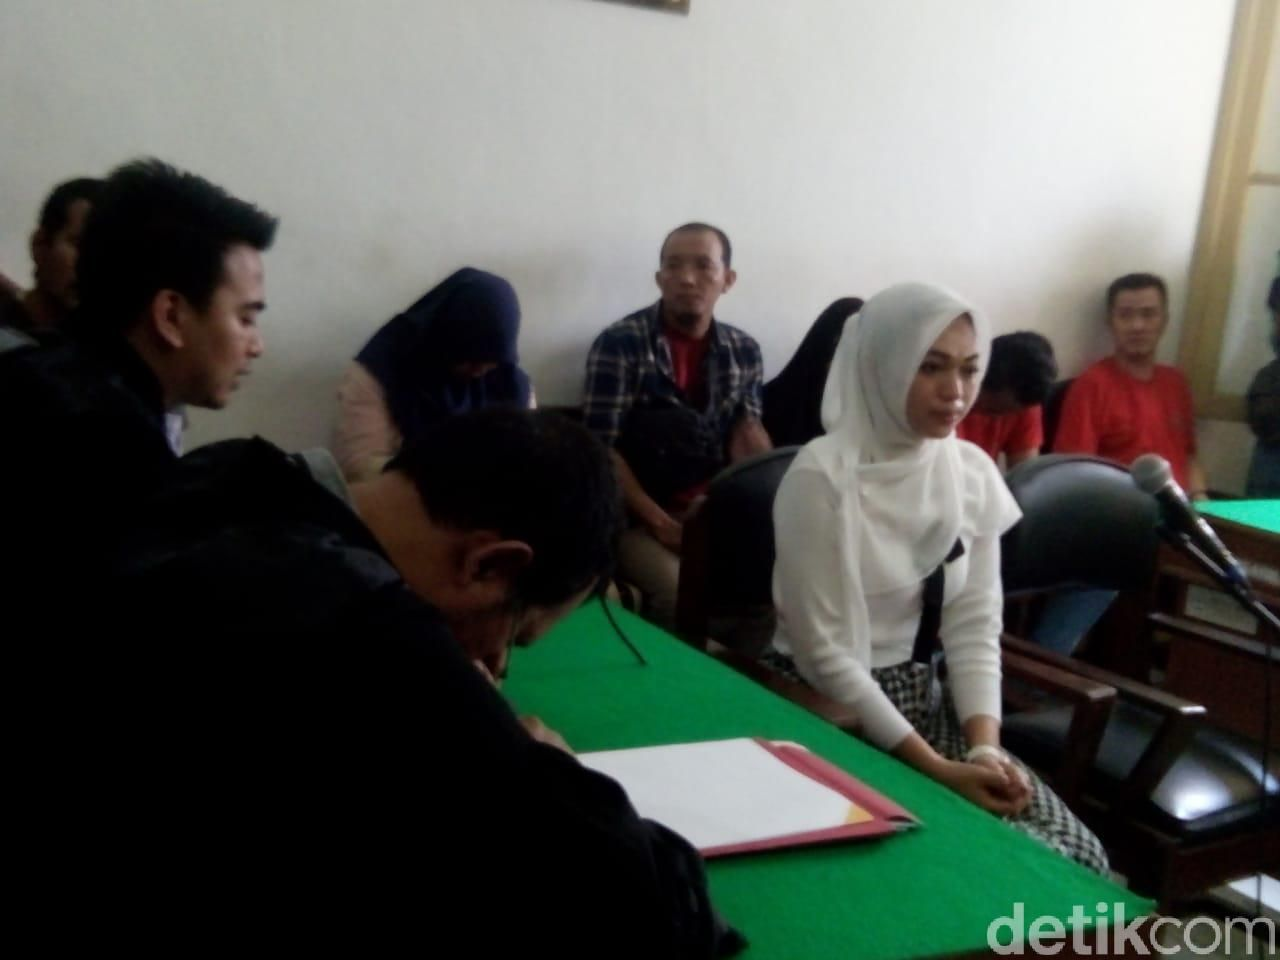 Ahmad Arfah Lubis-detikcom/ Sidang Febi Nur Amelia terdakwa kasus ITE tagih utang via IG